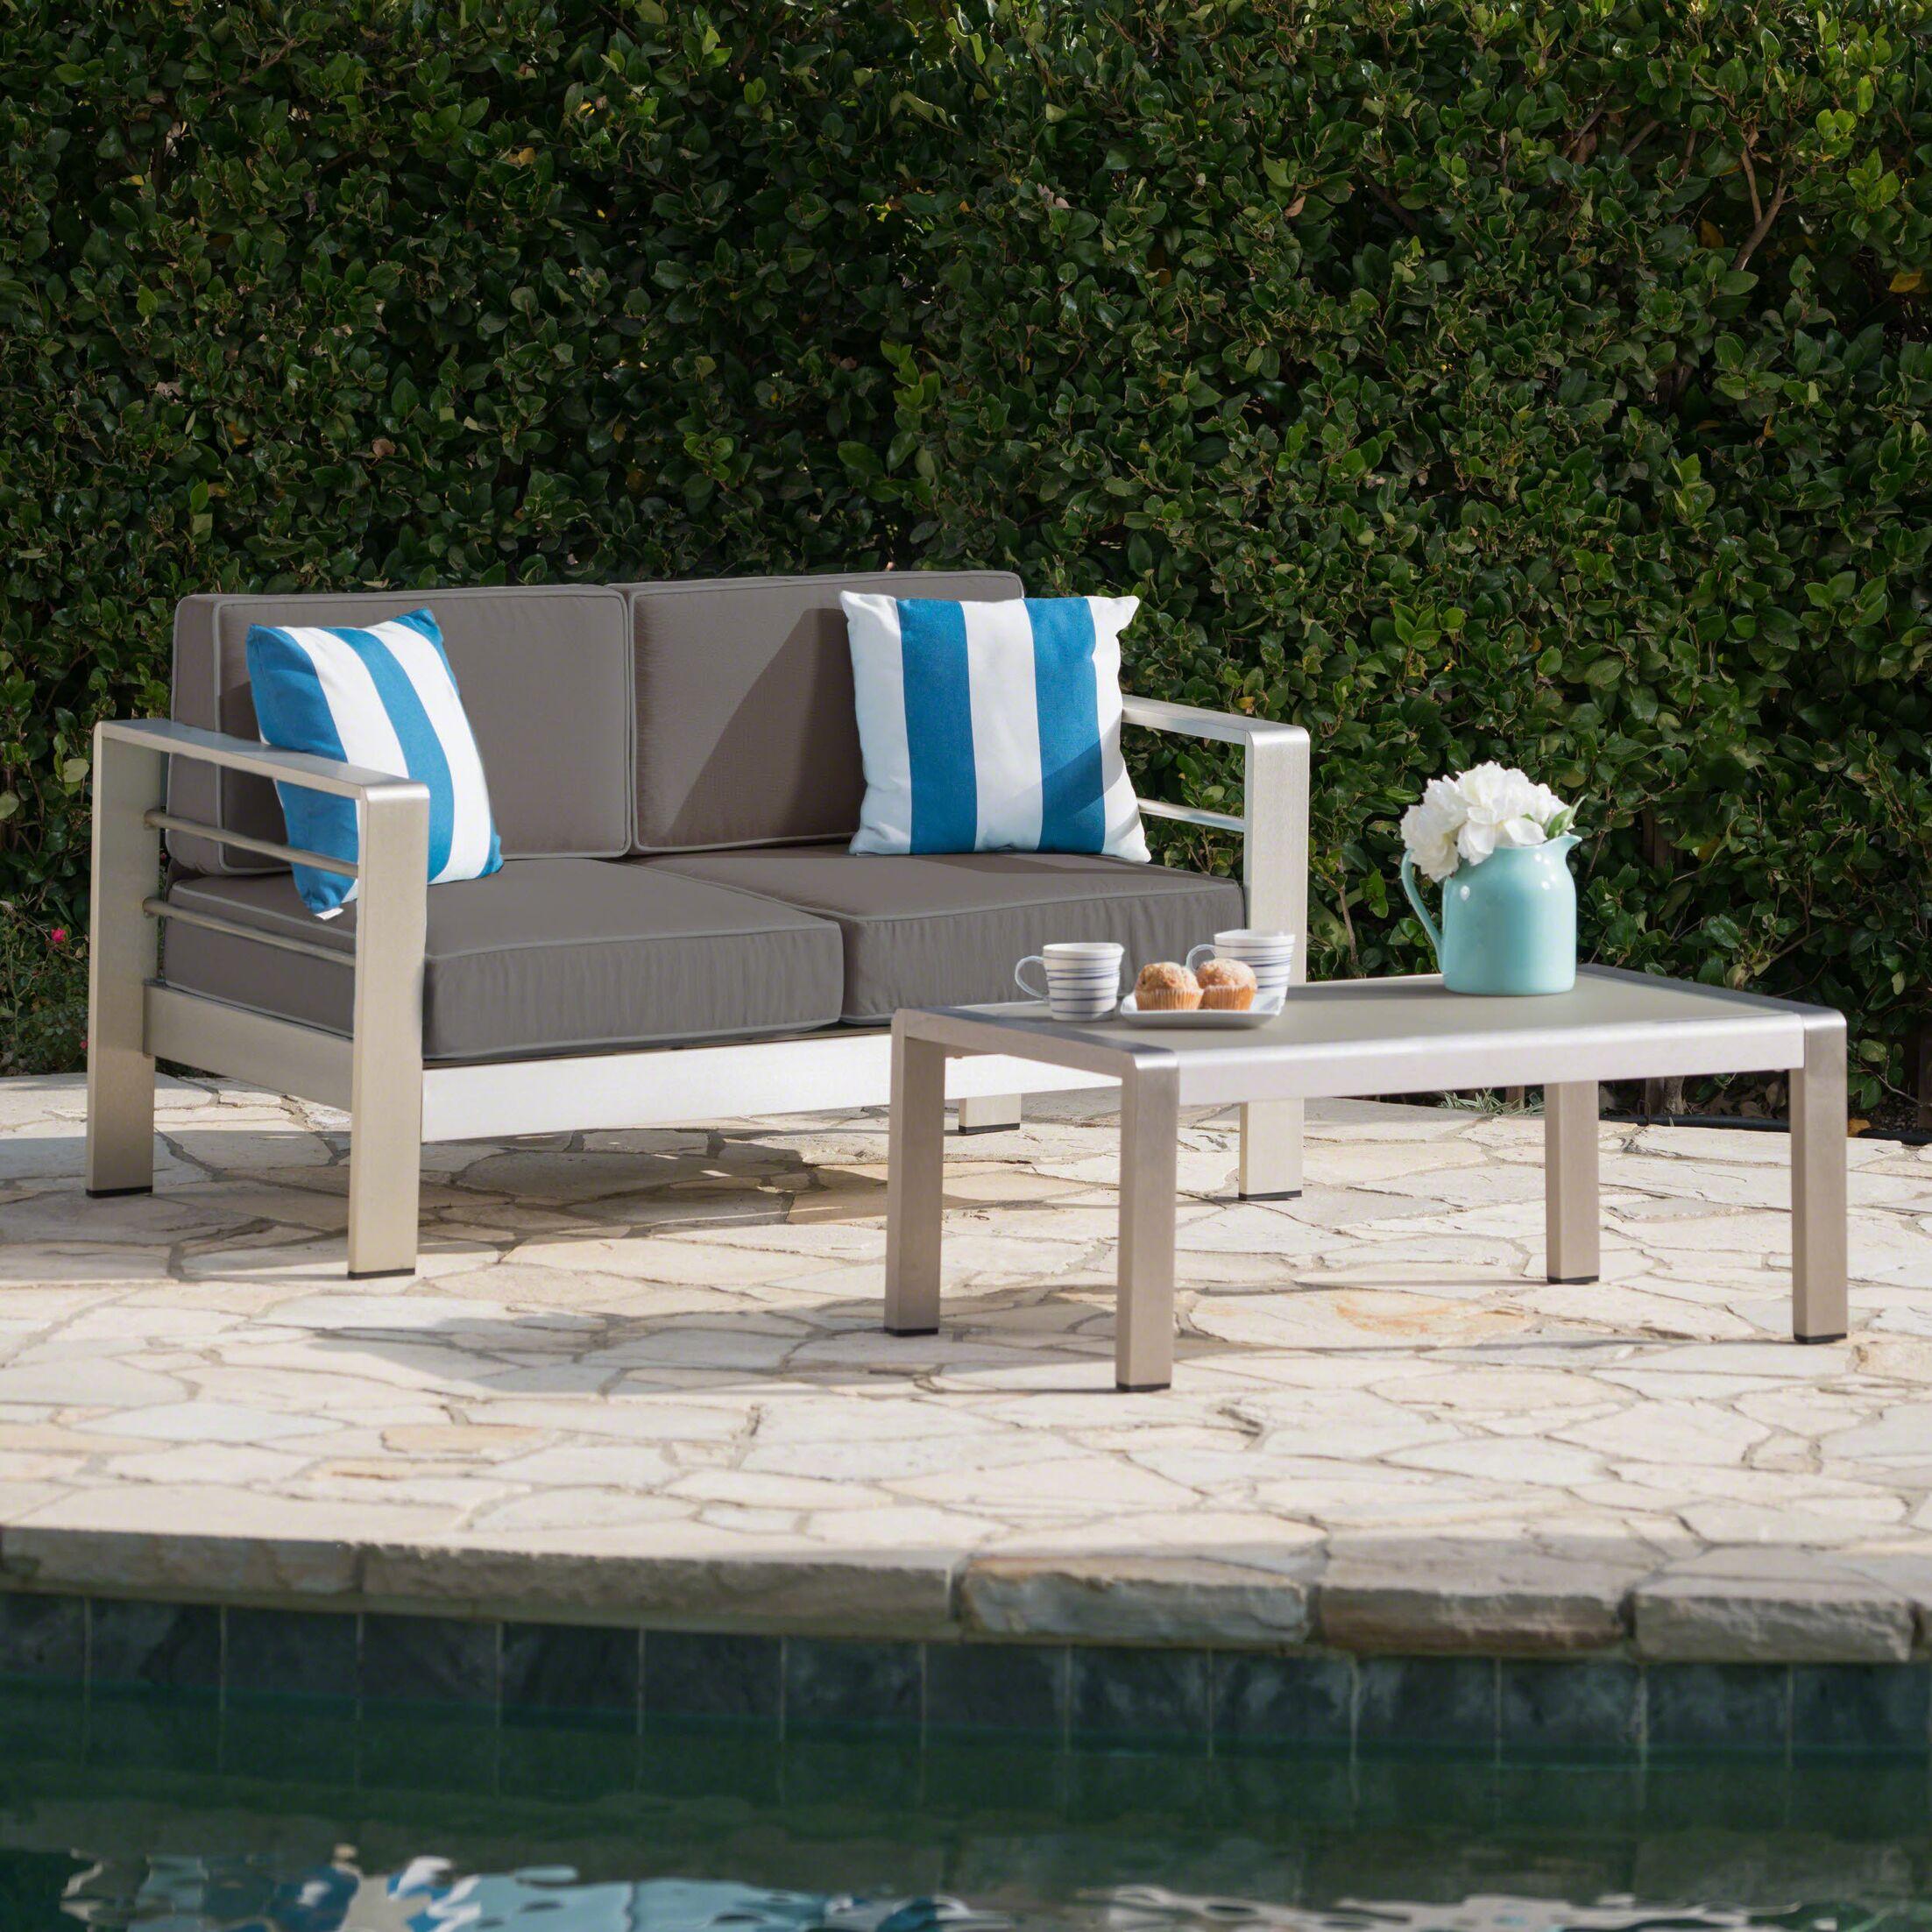 Orme 2 Piece Sofa Set with Cushions Frame Color: Gray, Cushion Color: Khaki